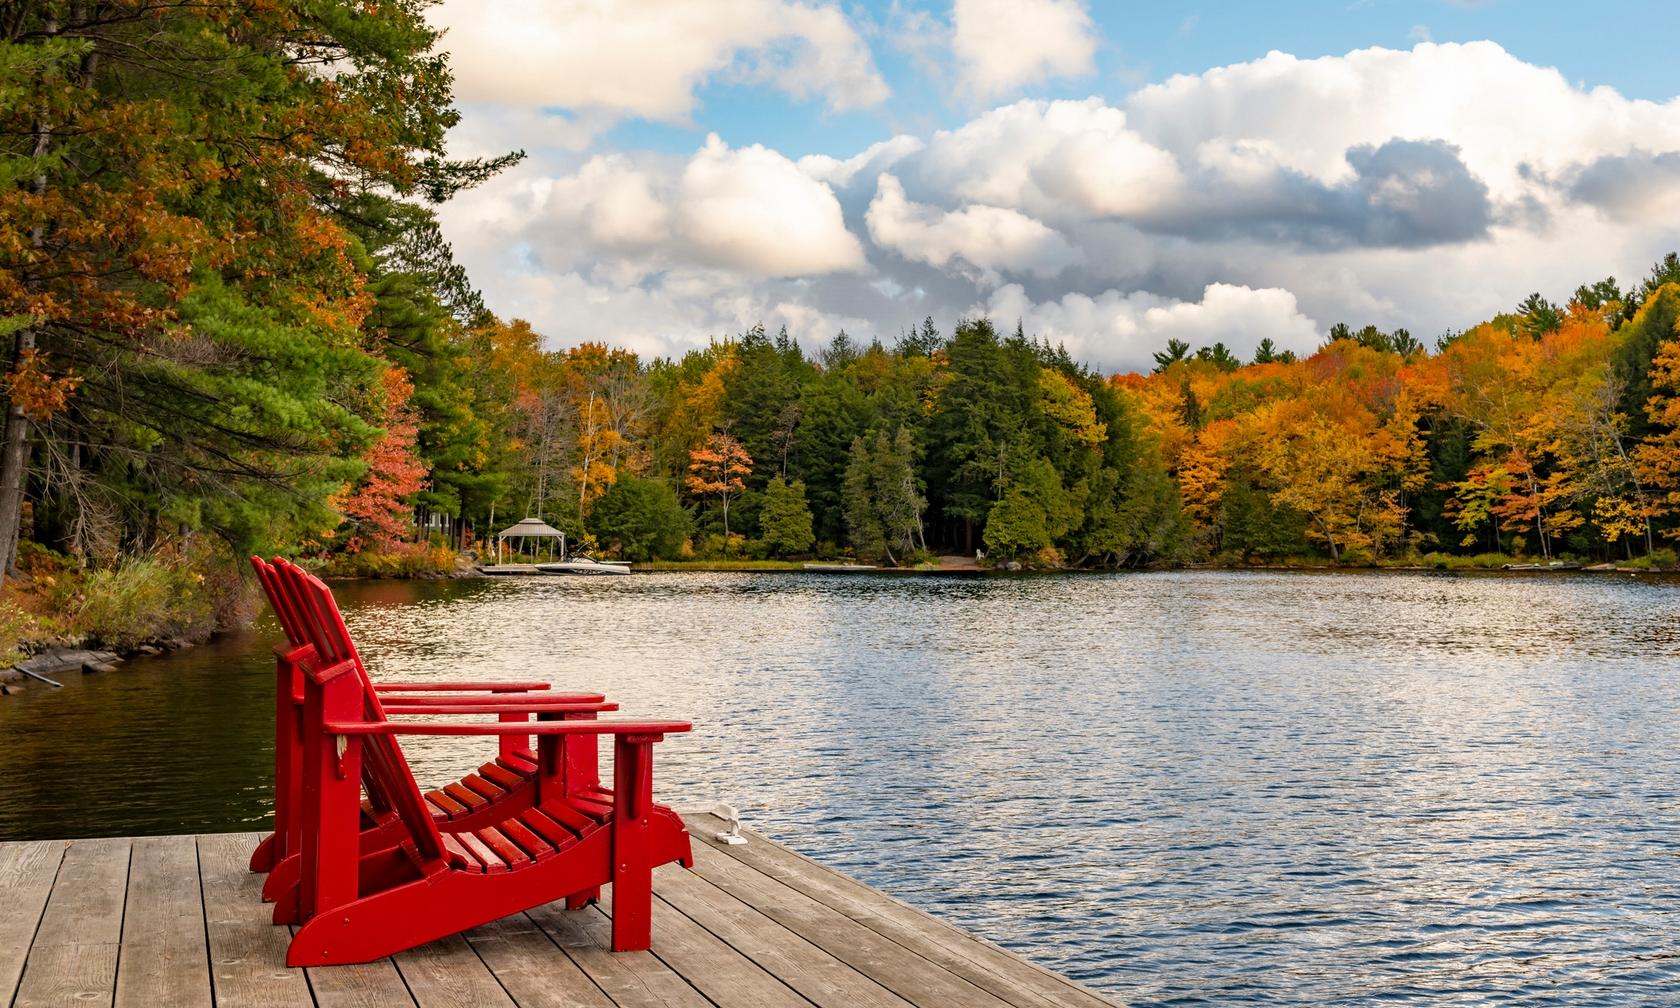 Vacation rentals in Muskoka Lakes